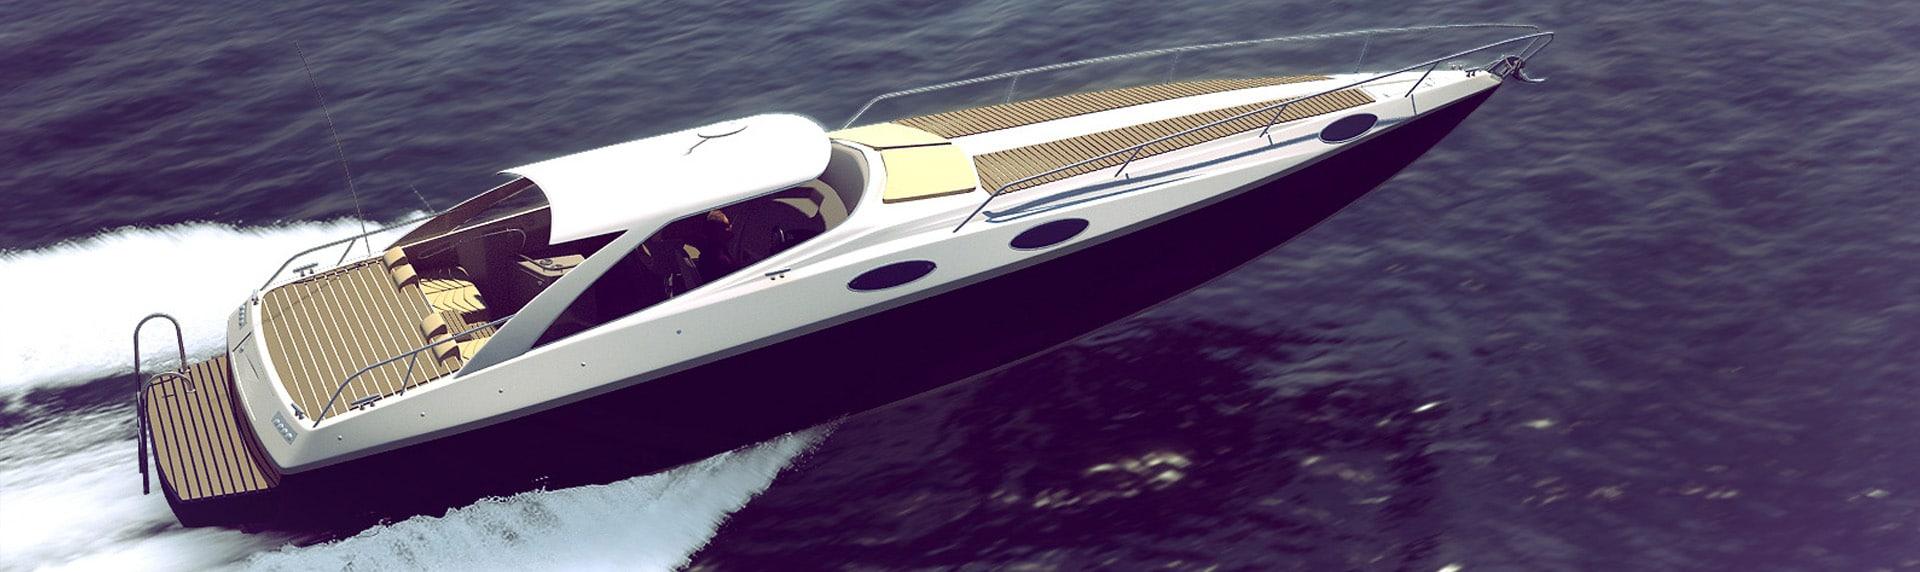 Speed boat 3D